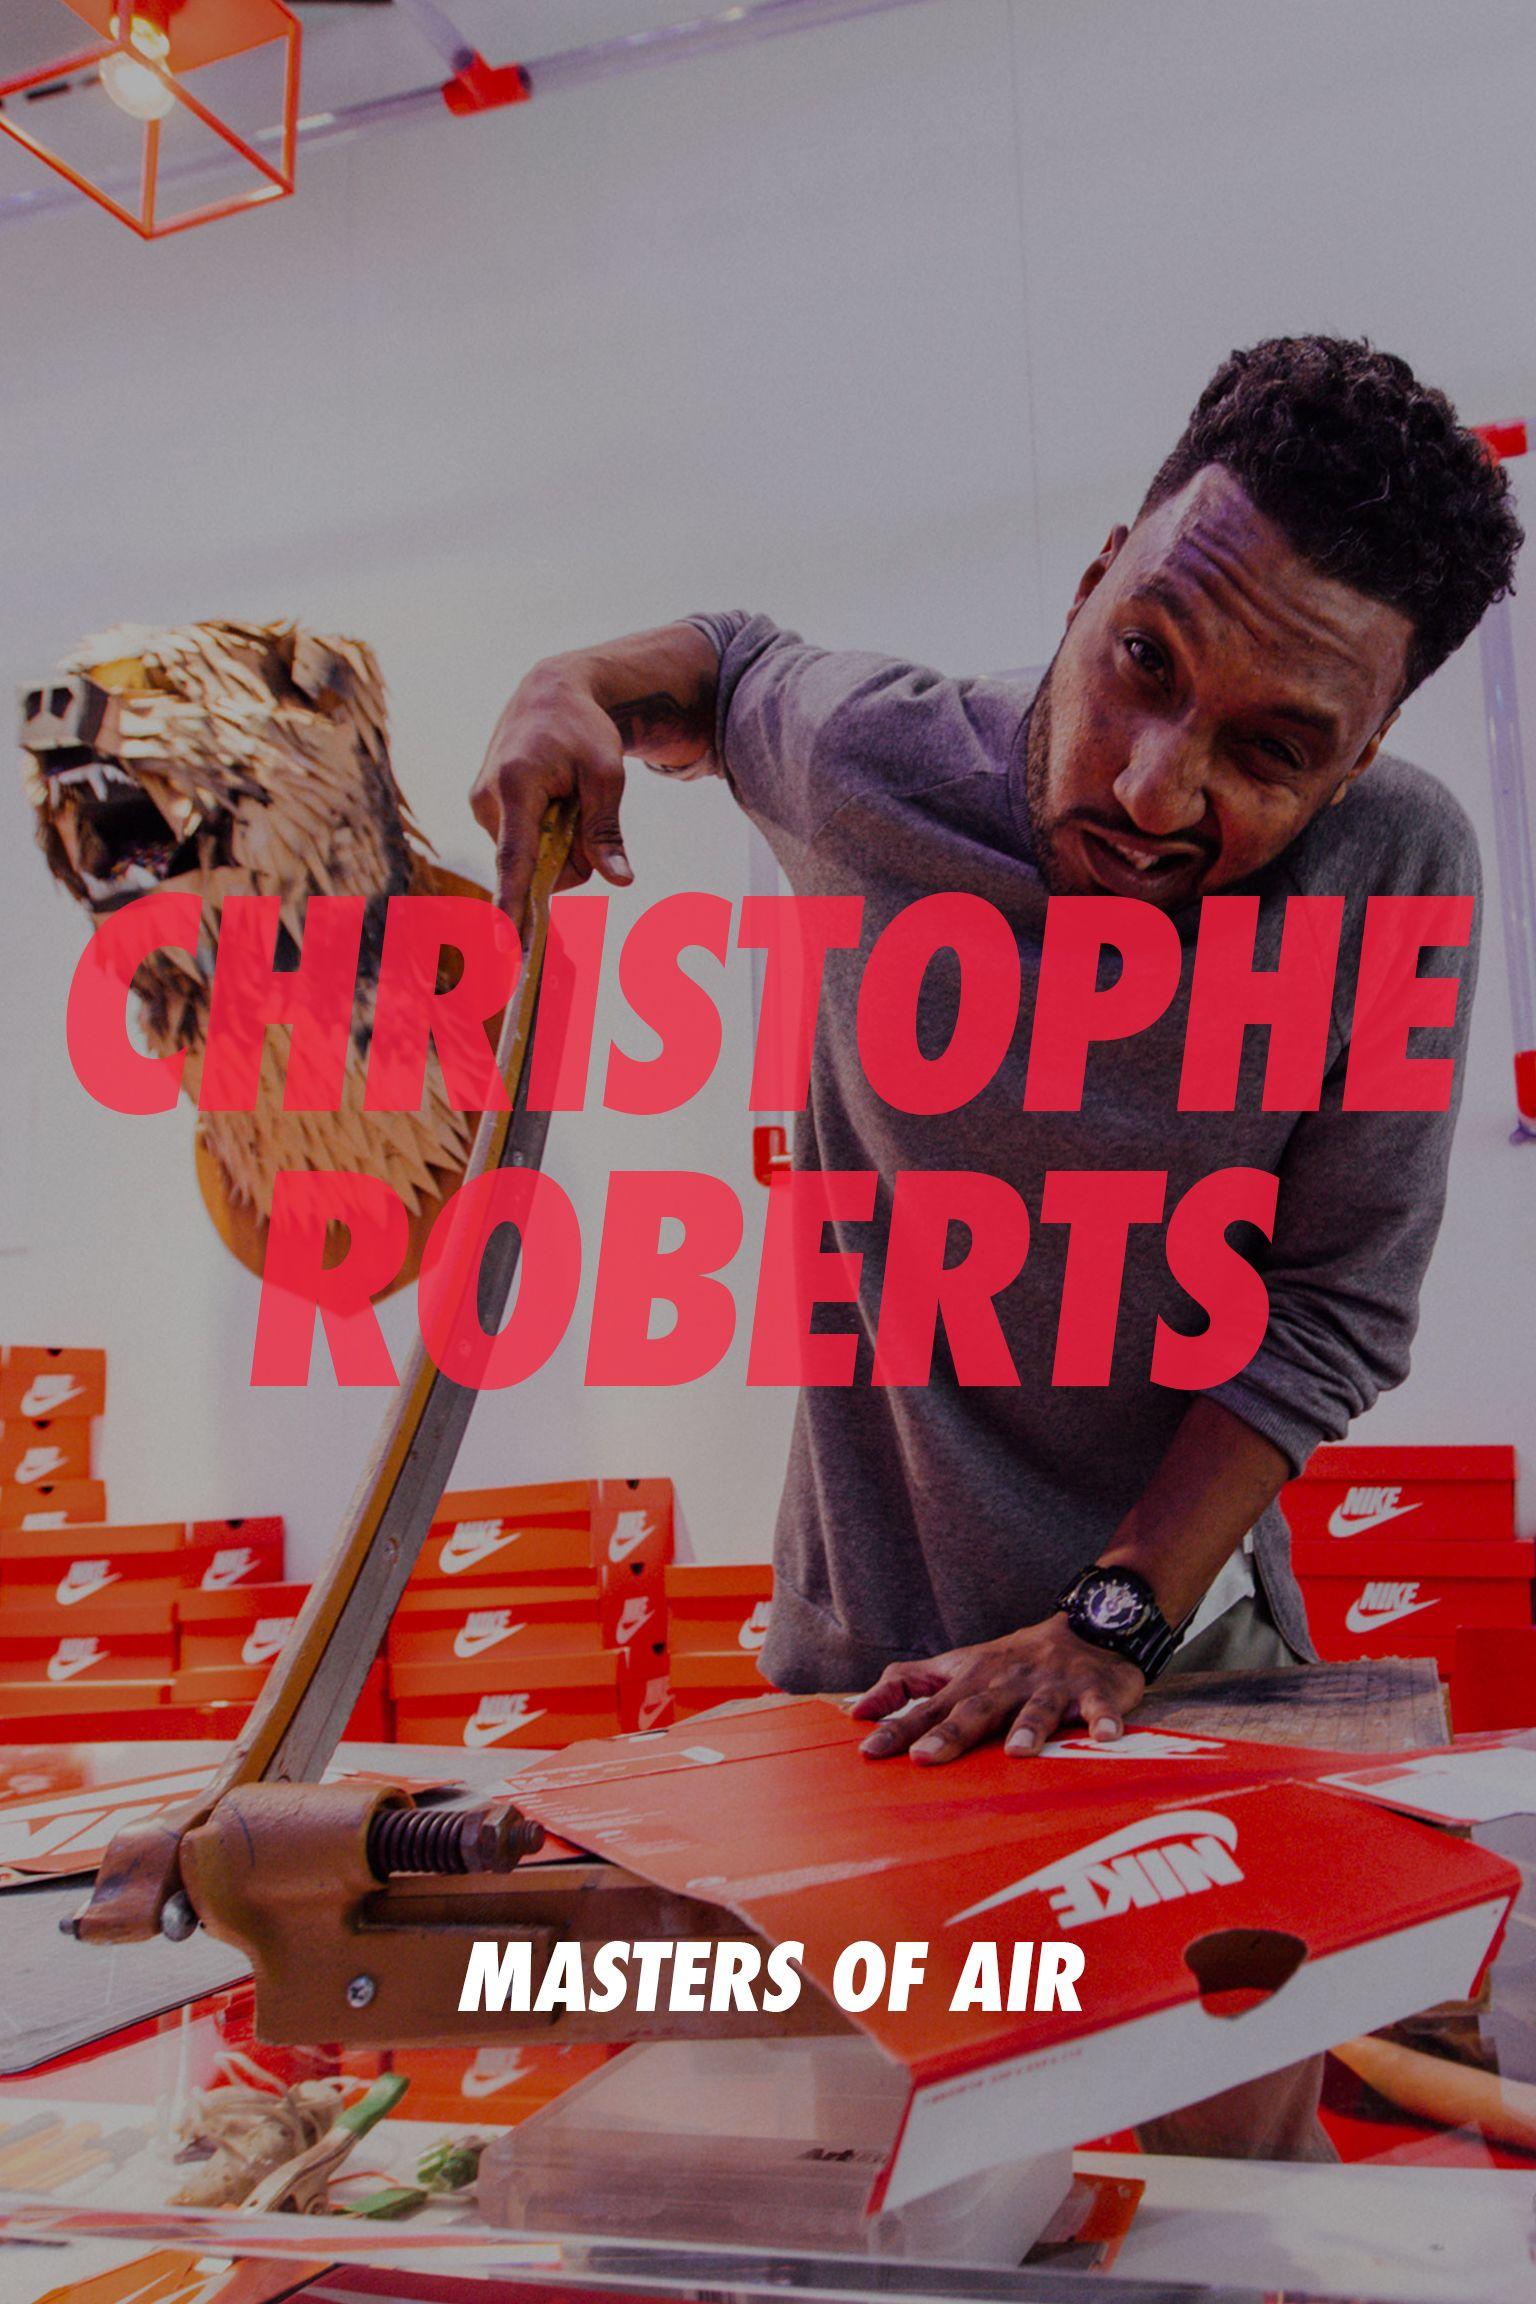 Masters of Air: Christophe Roberts